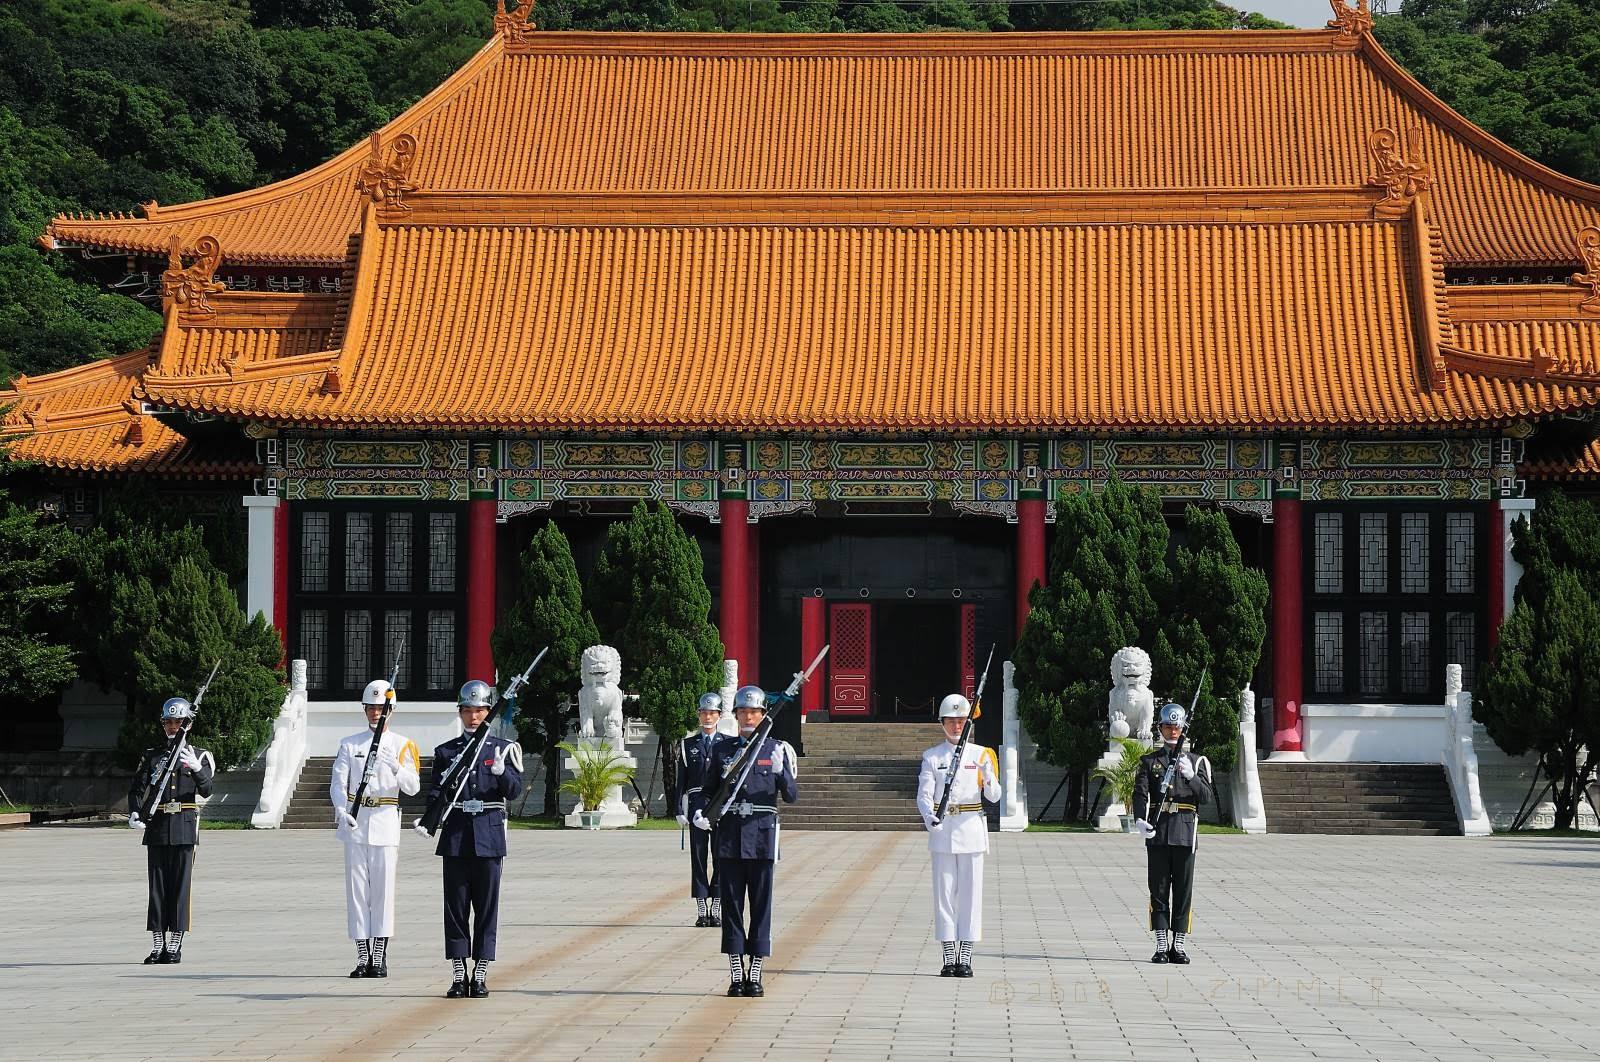 Huei Fong Travel Service